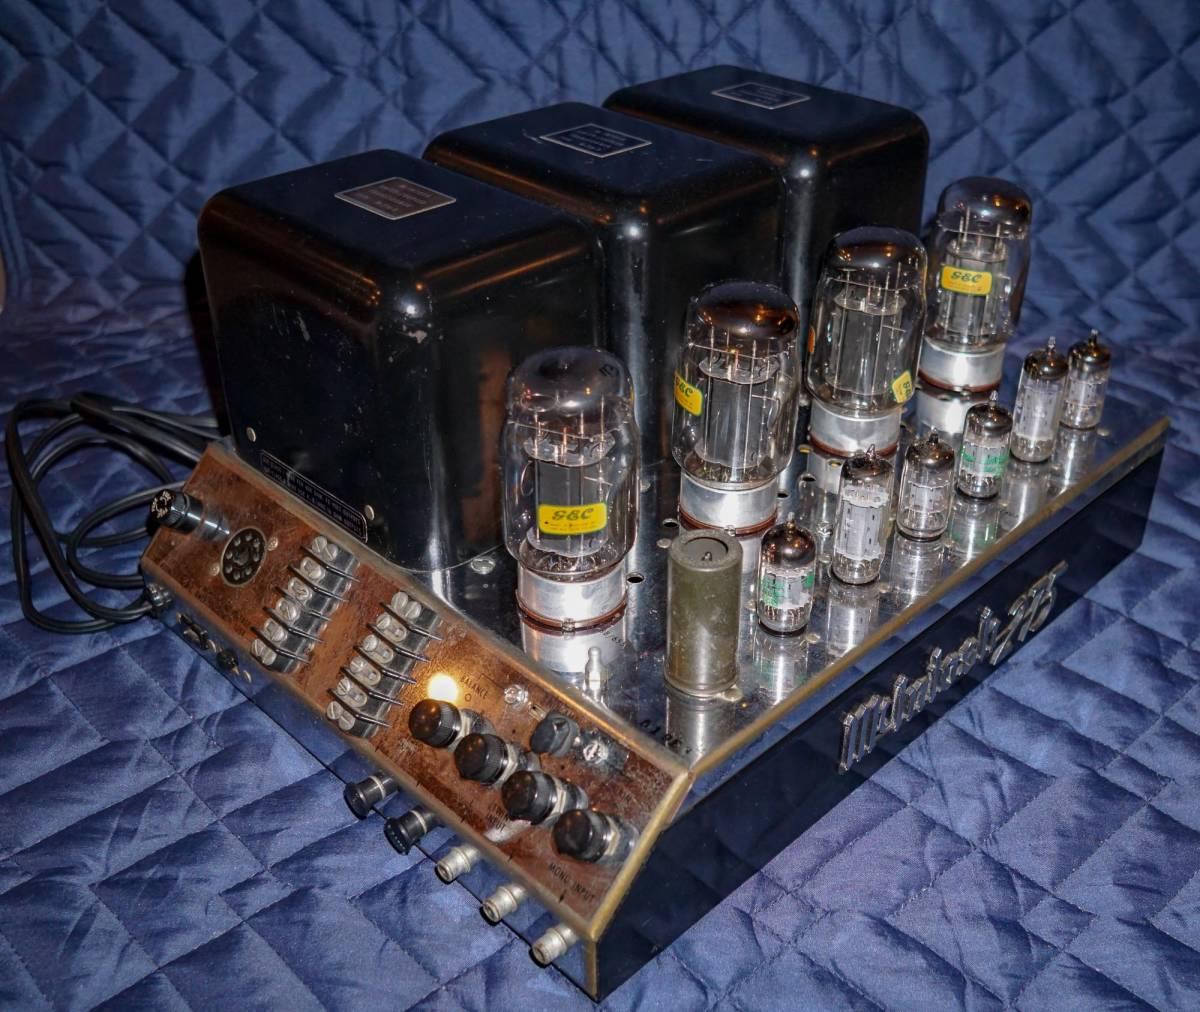 McIntosh / Macintosh MC275 original GEC KT88 use tube lamp type power amplifier Vintage electrification operation verification